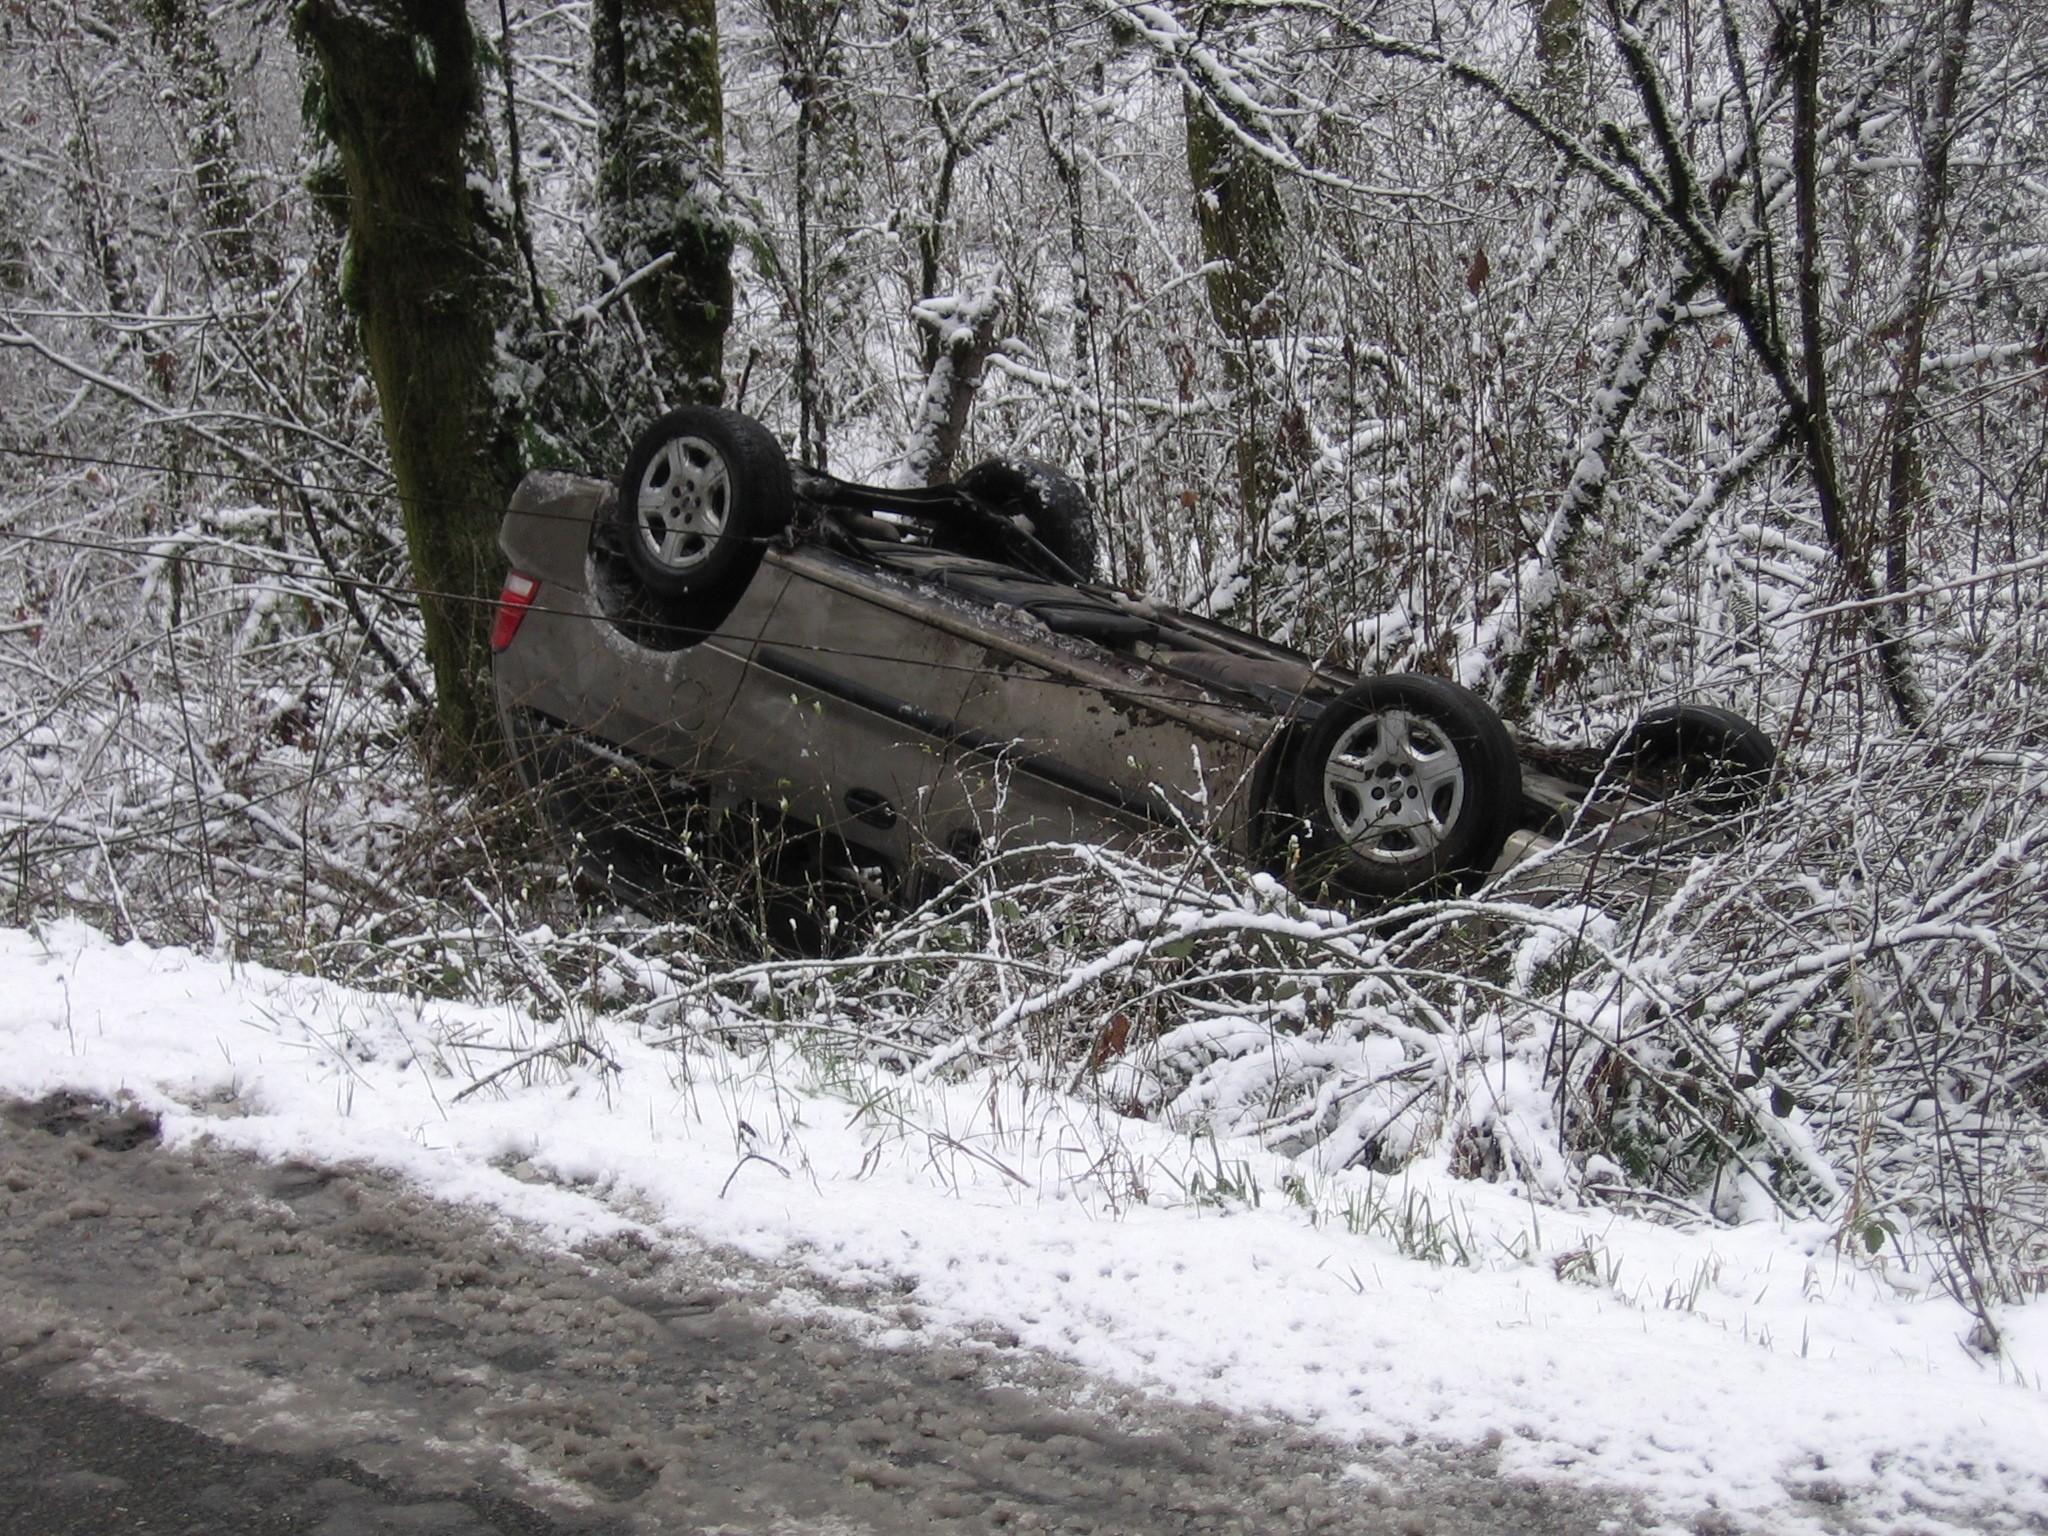 Record Cold Turns Roads Treacherous The Mountain News Wa